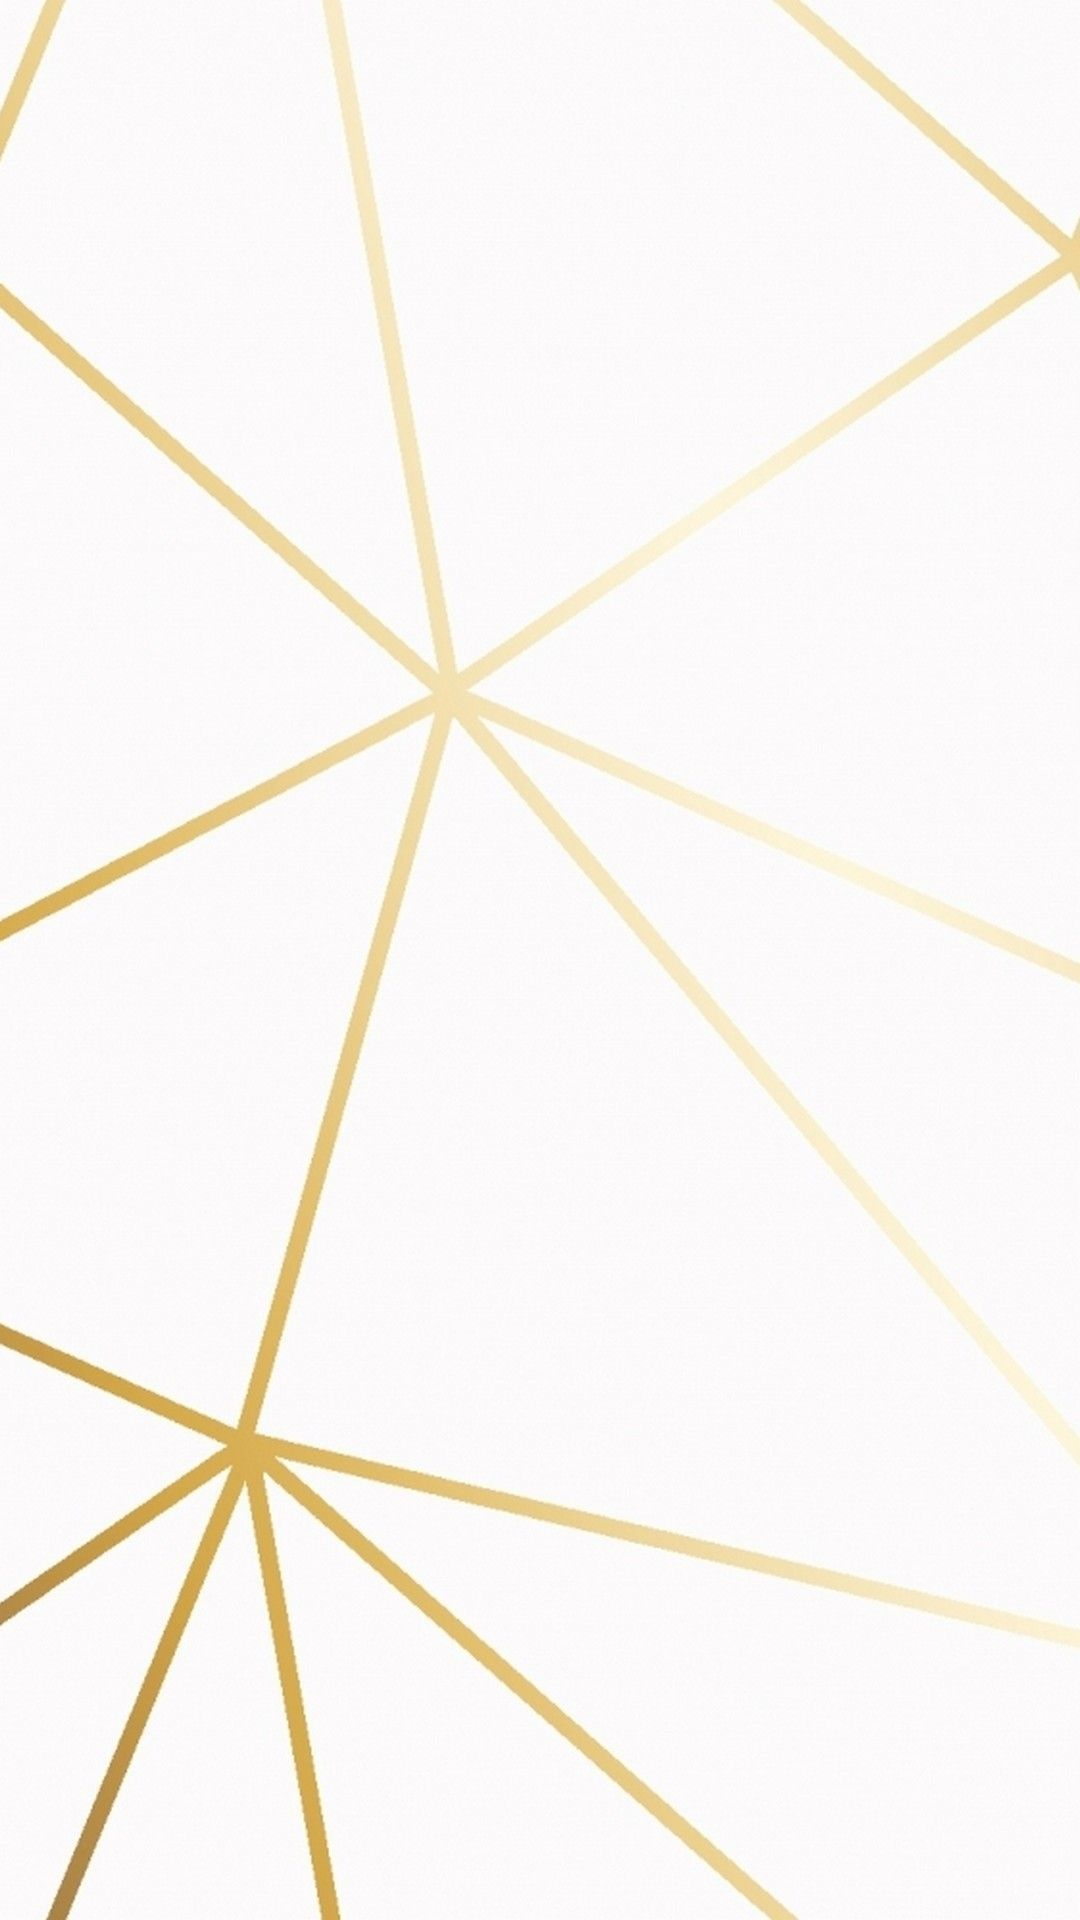 Gold Hd Iphone Wallpaper Hupages Download Iphone Wallpapers Gold Wallpaper Iphone Iphone Wallpaper Modern Gold Wallpaper Hd